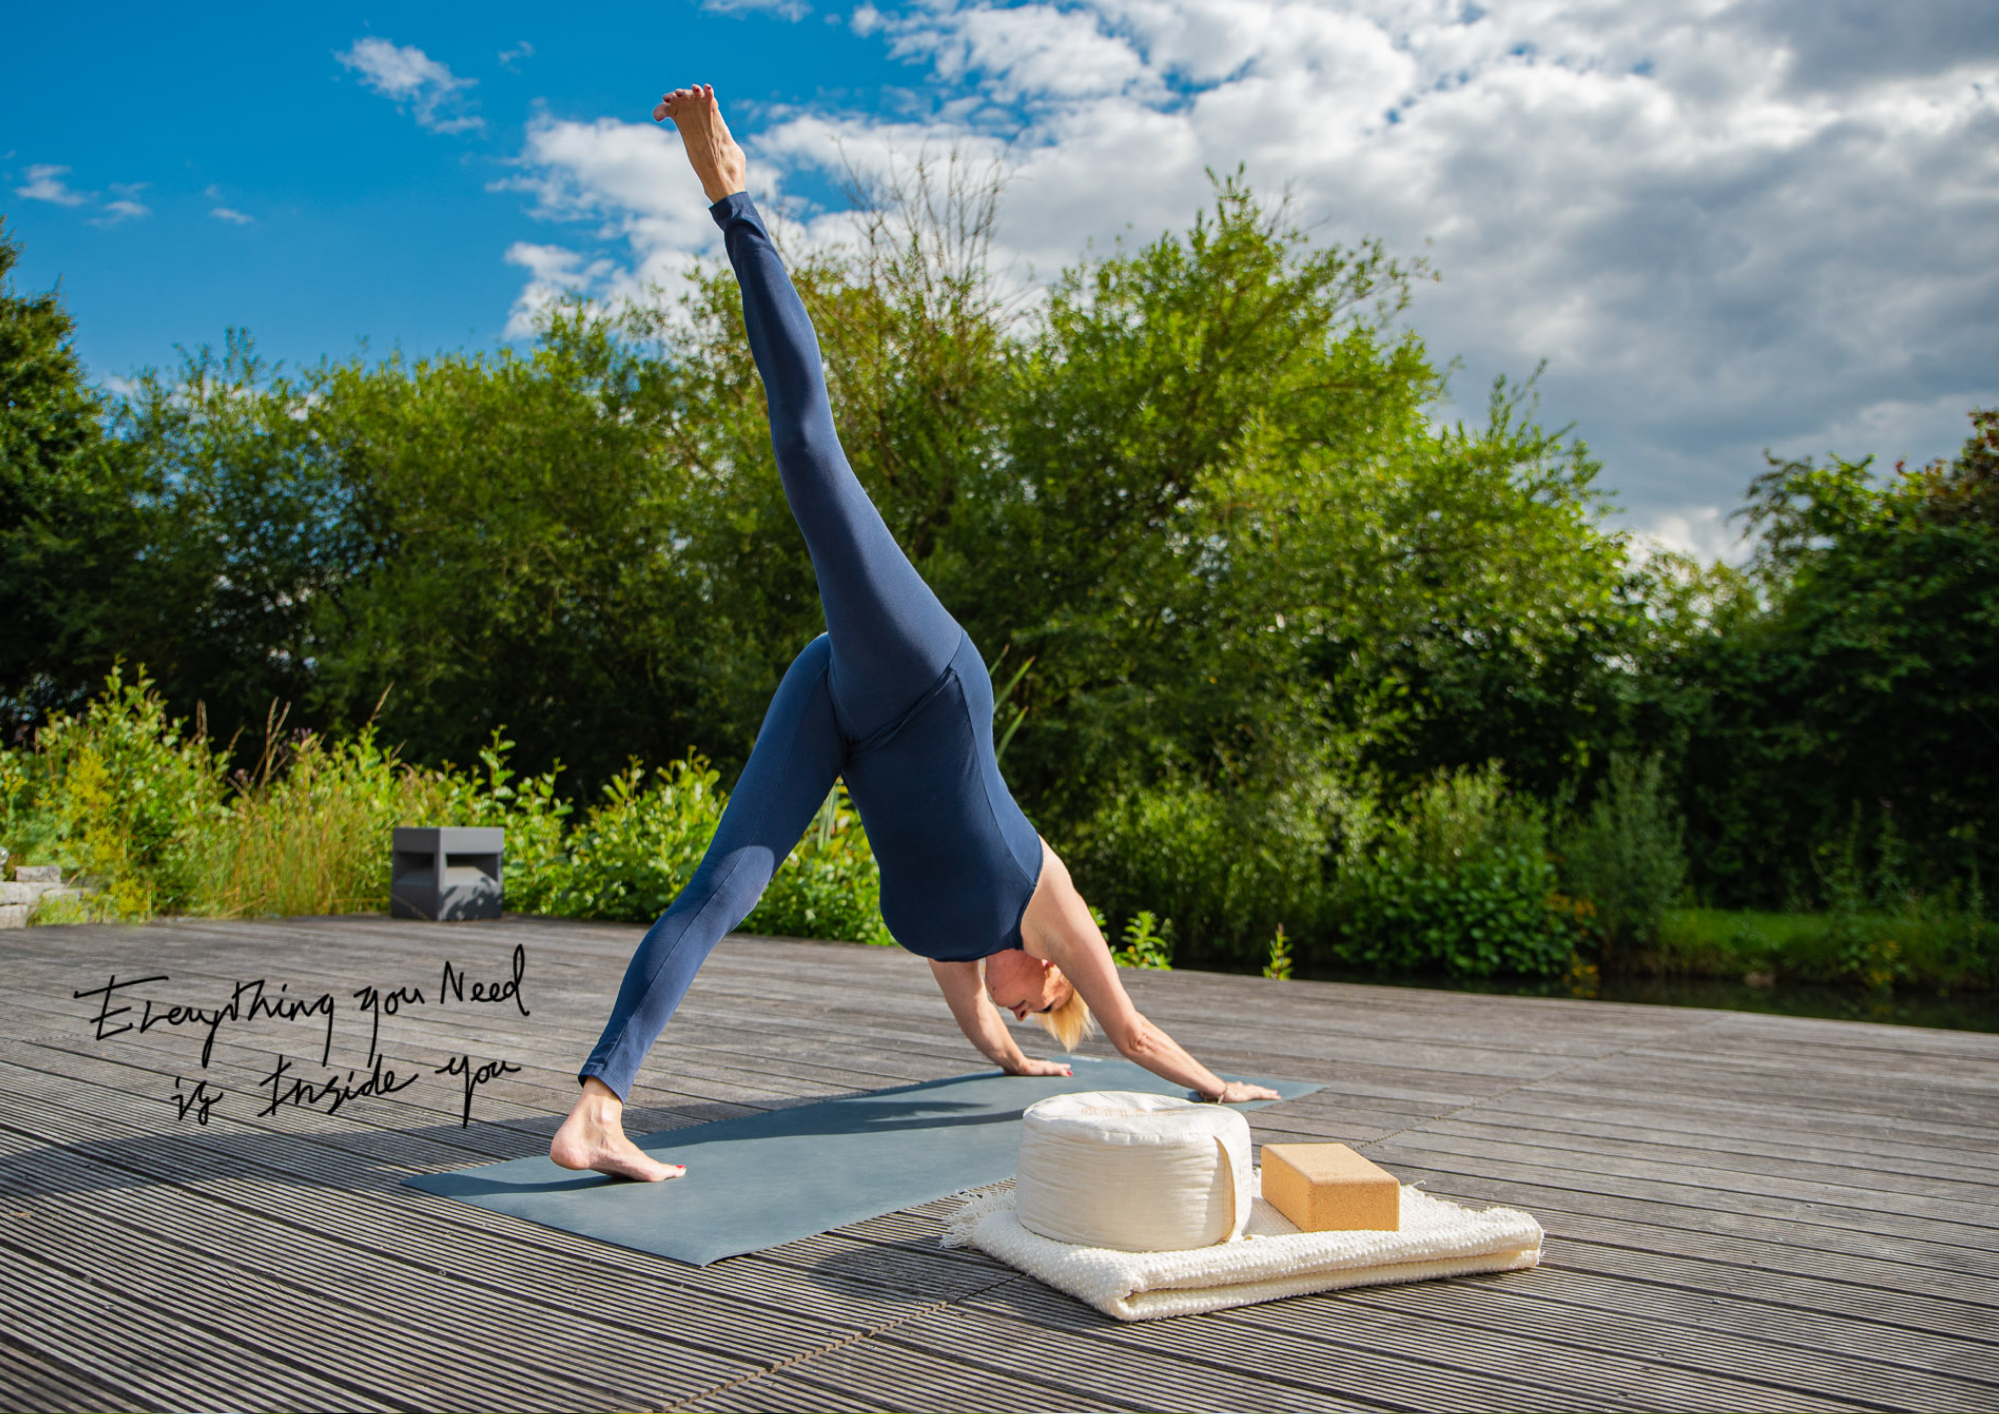 Yogawerkstatt22 Dein Yogastudio In Kosching